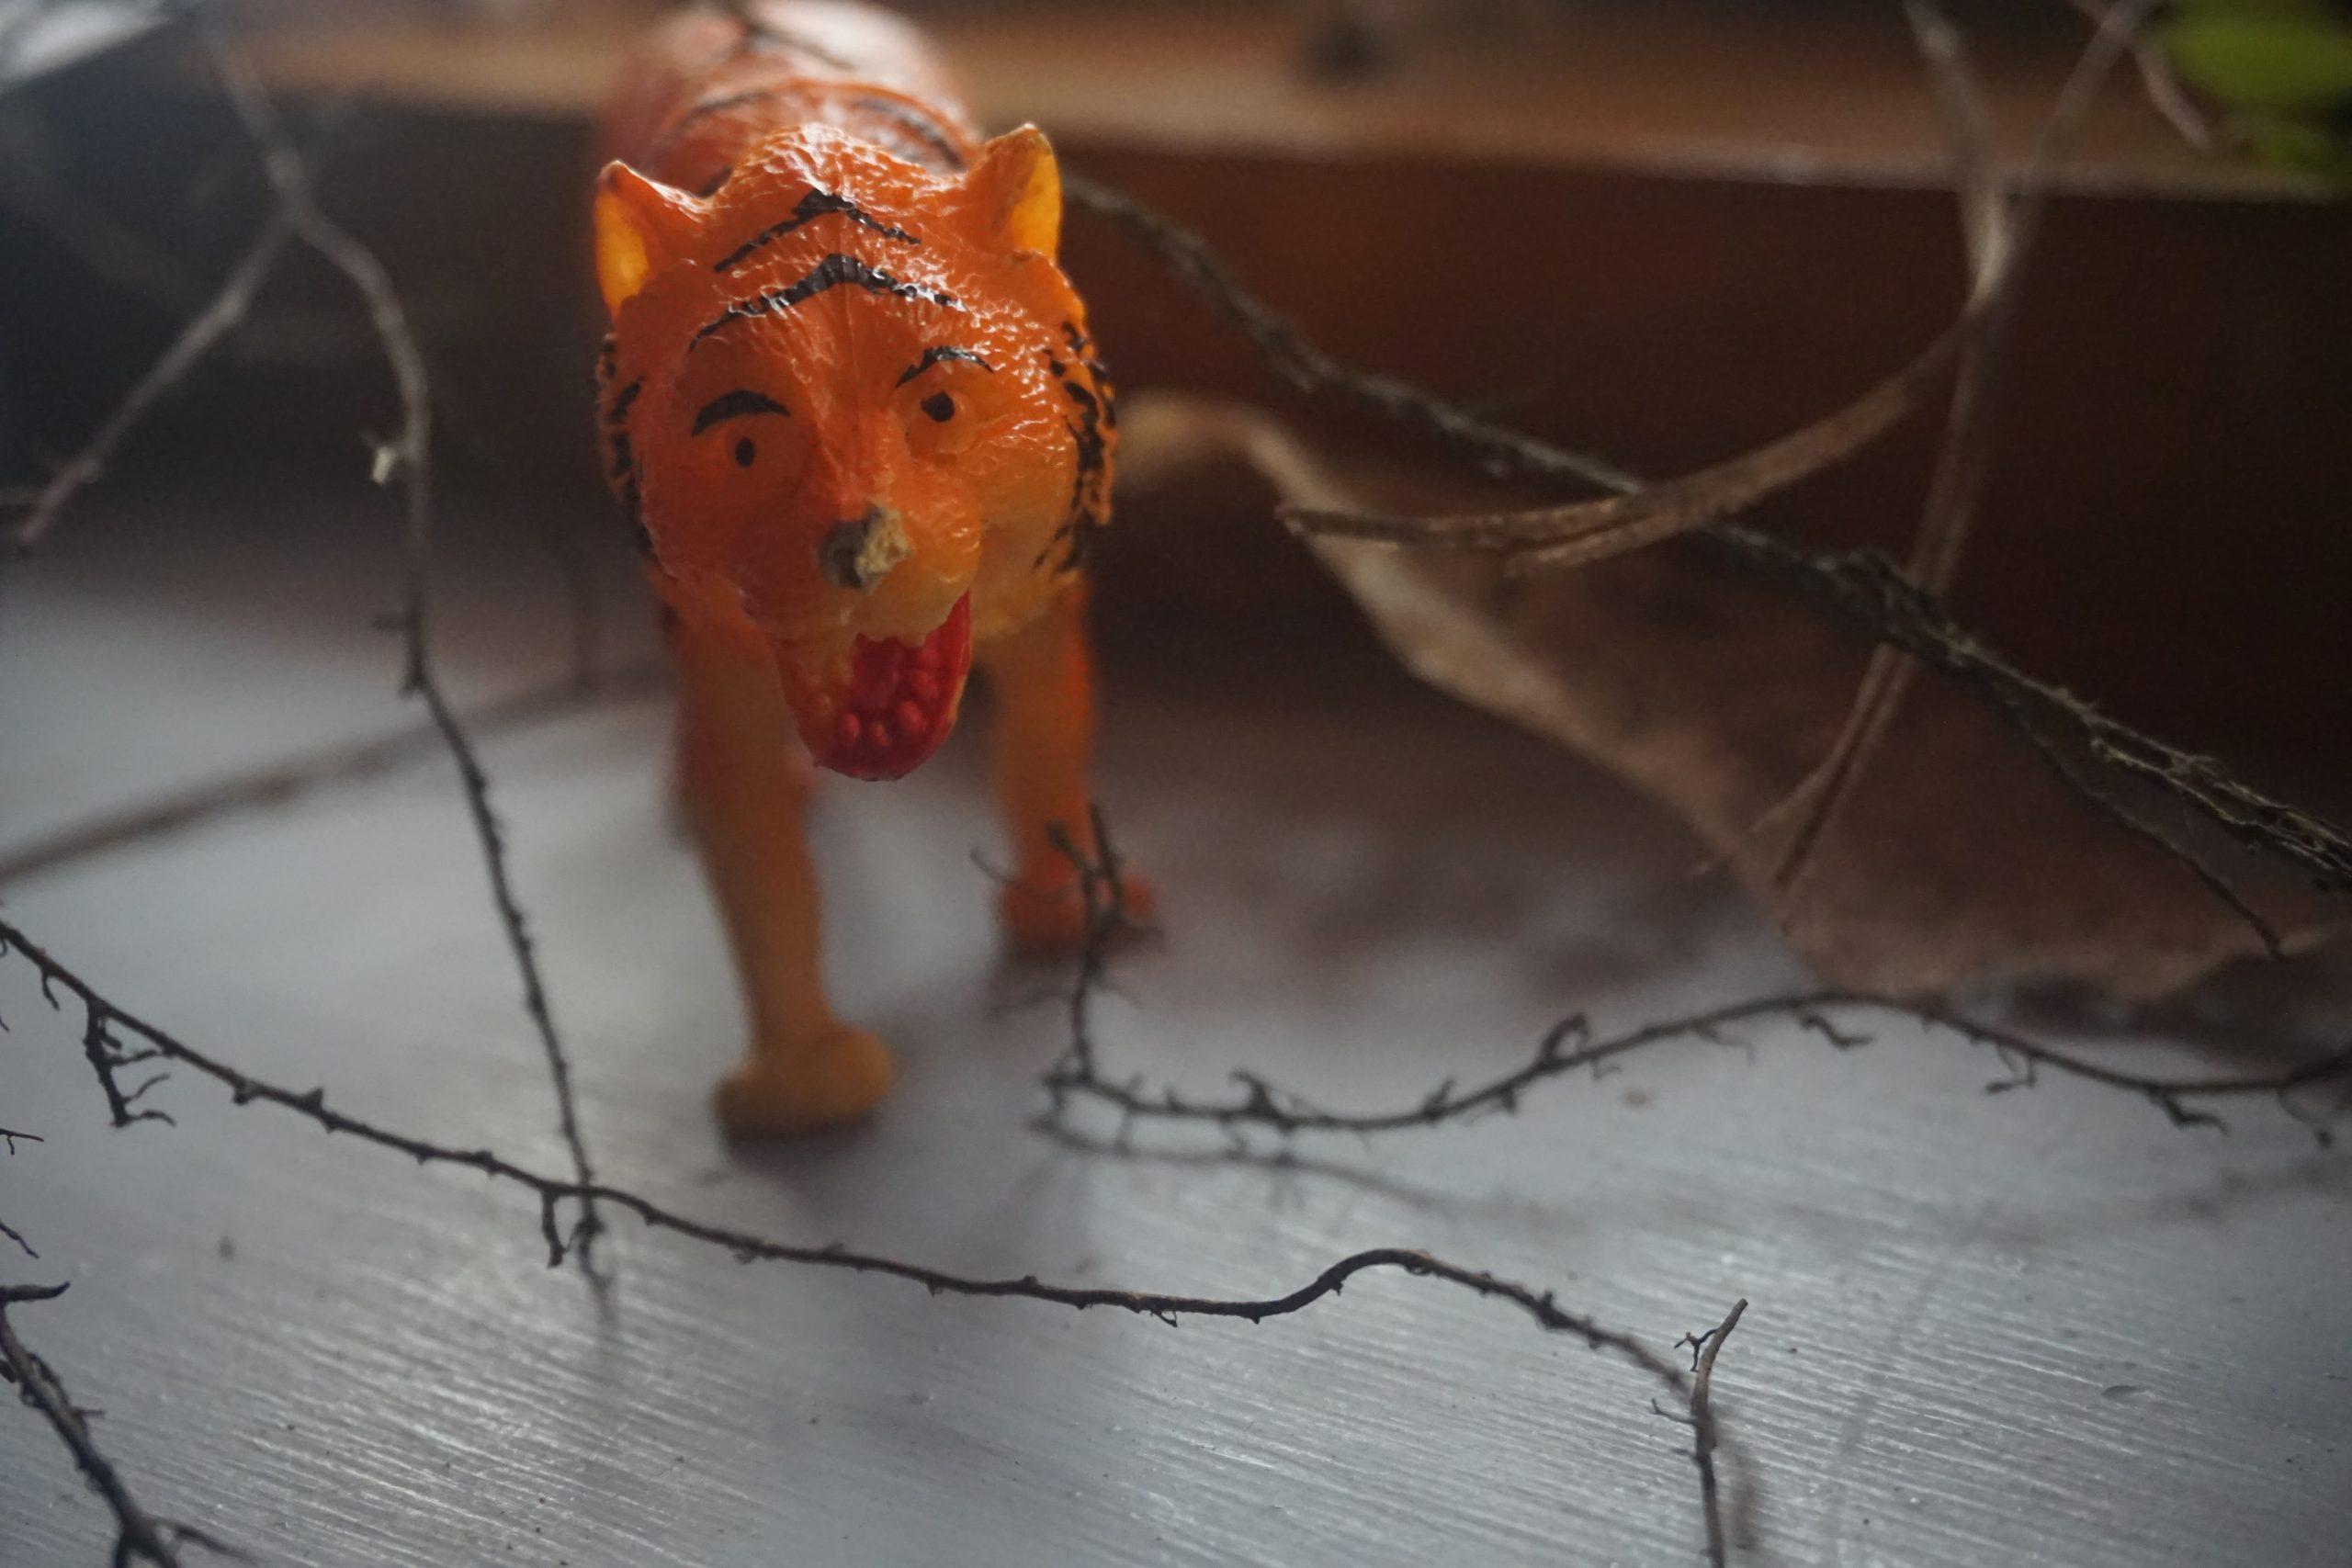 Tiger Toy Display